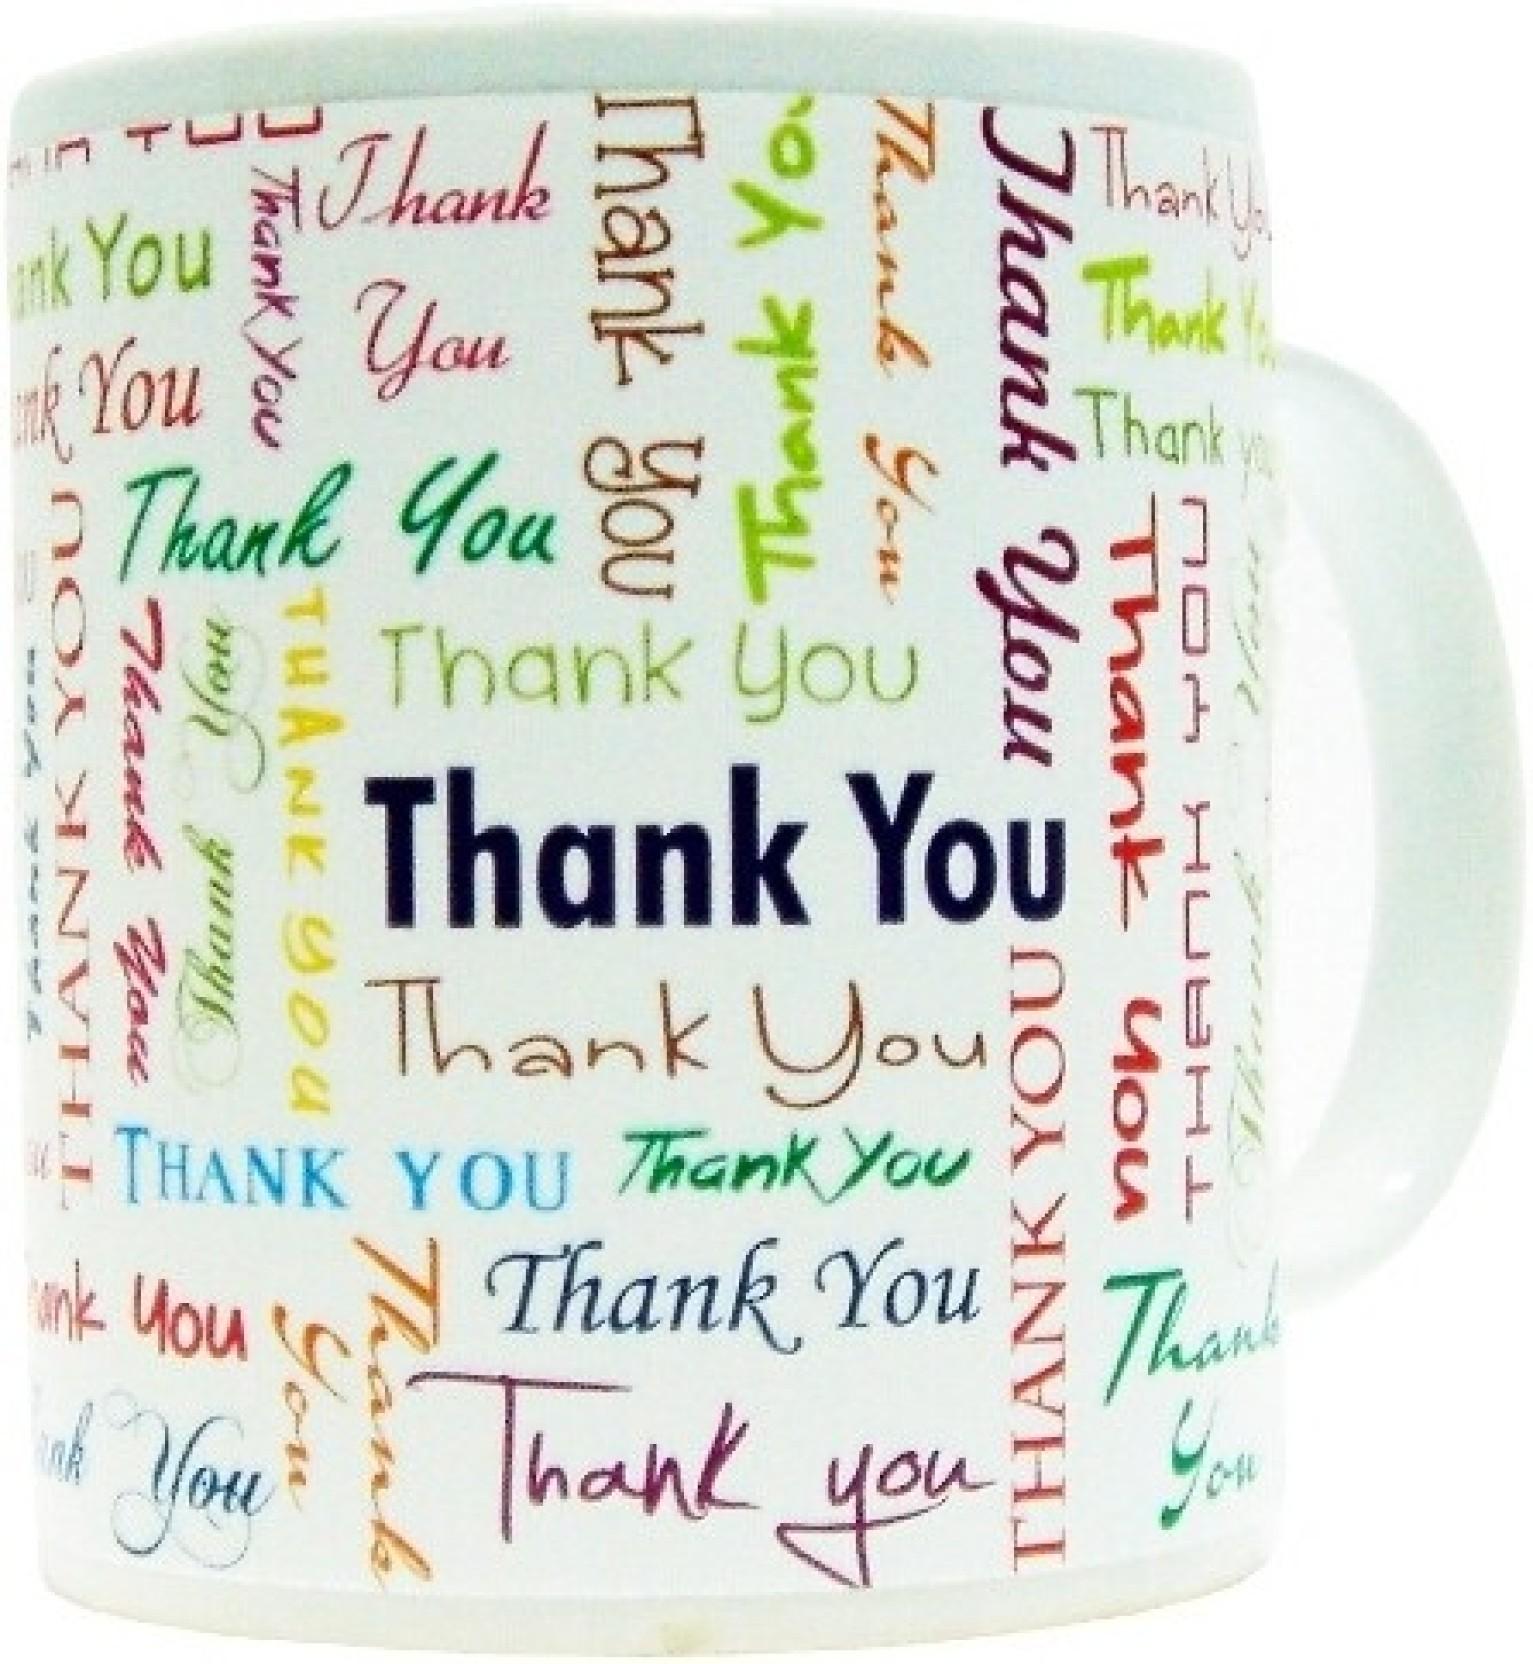 Everyday Gifts Emotional Gift Thank You Ceramic Mug. Share